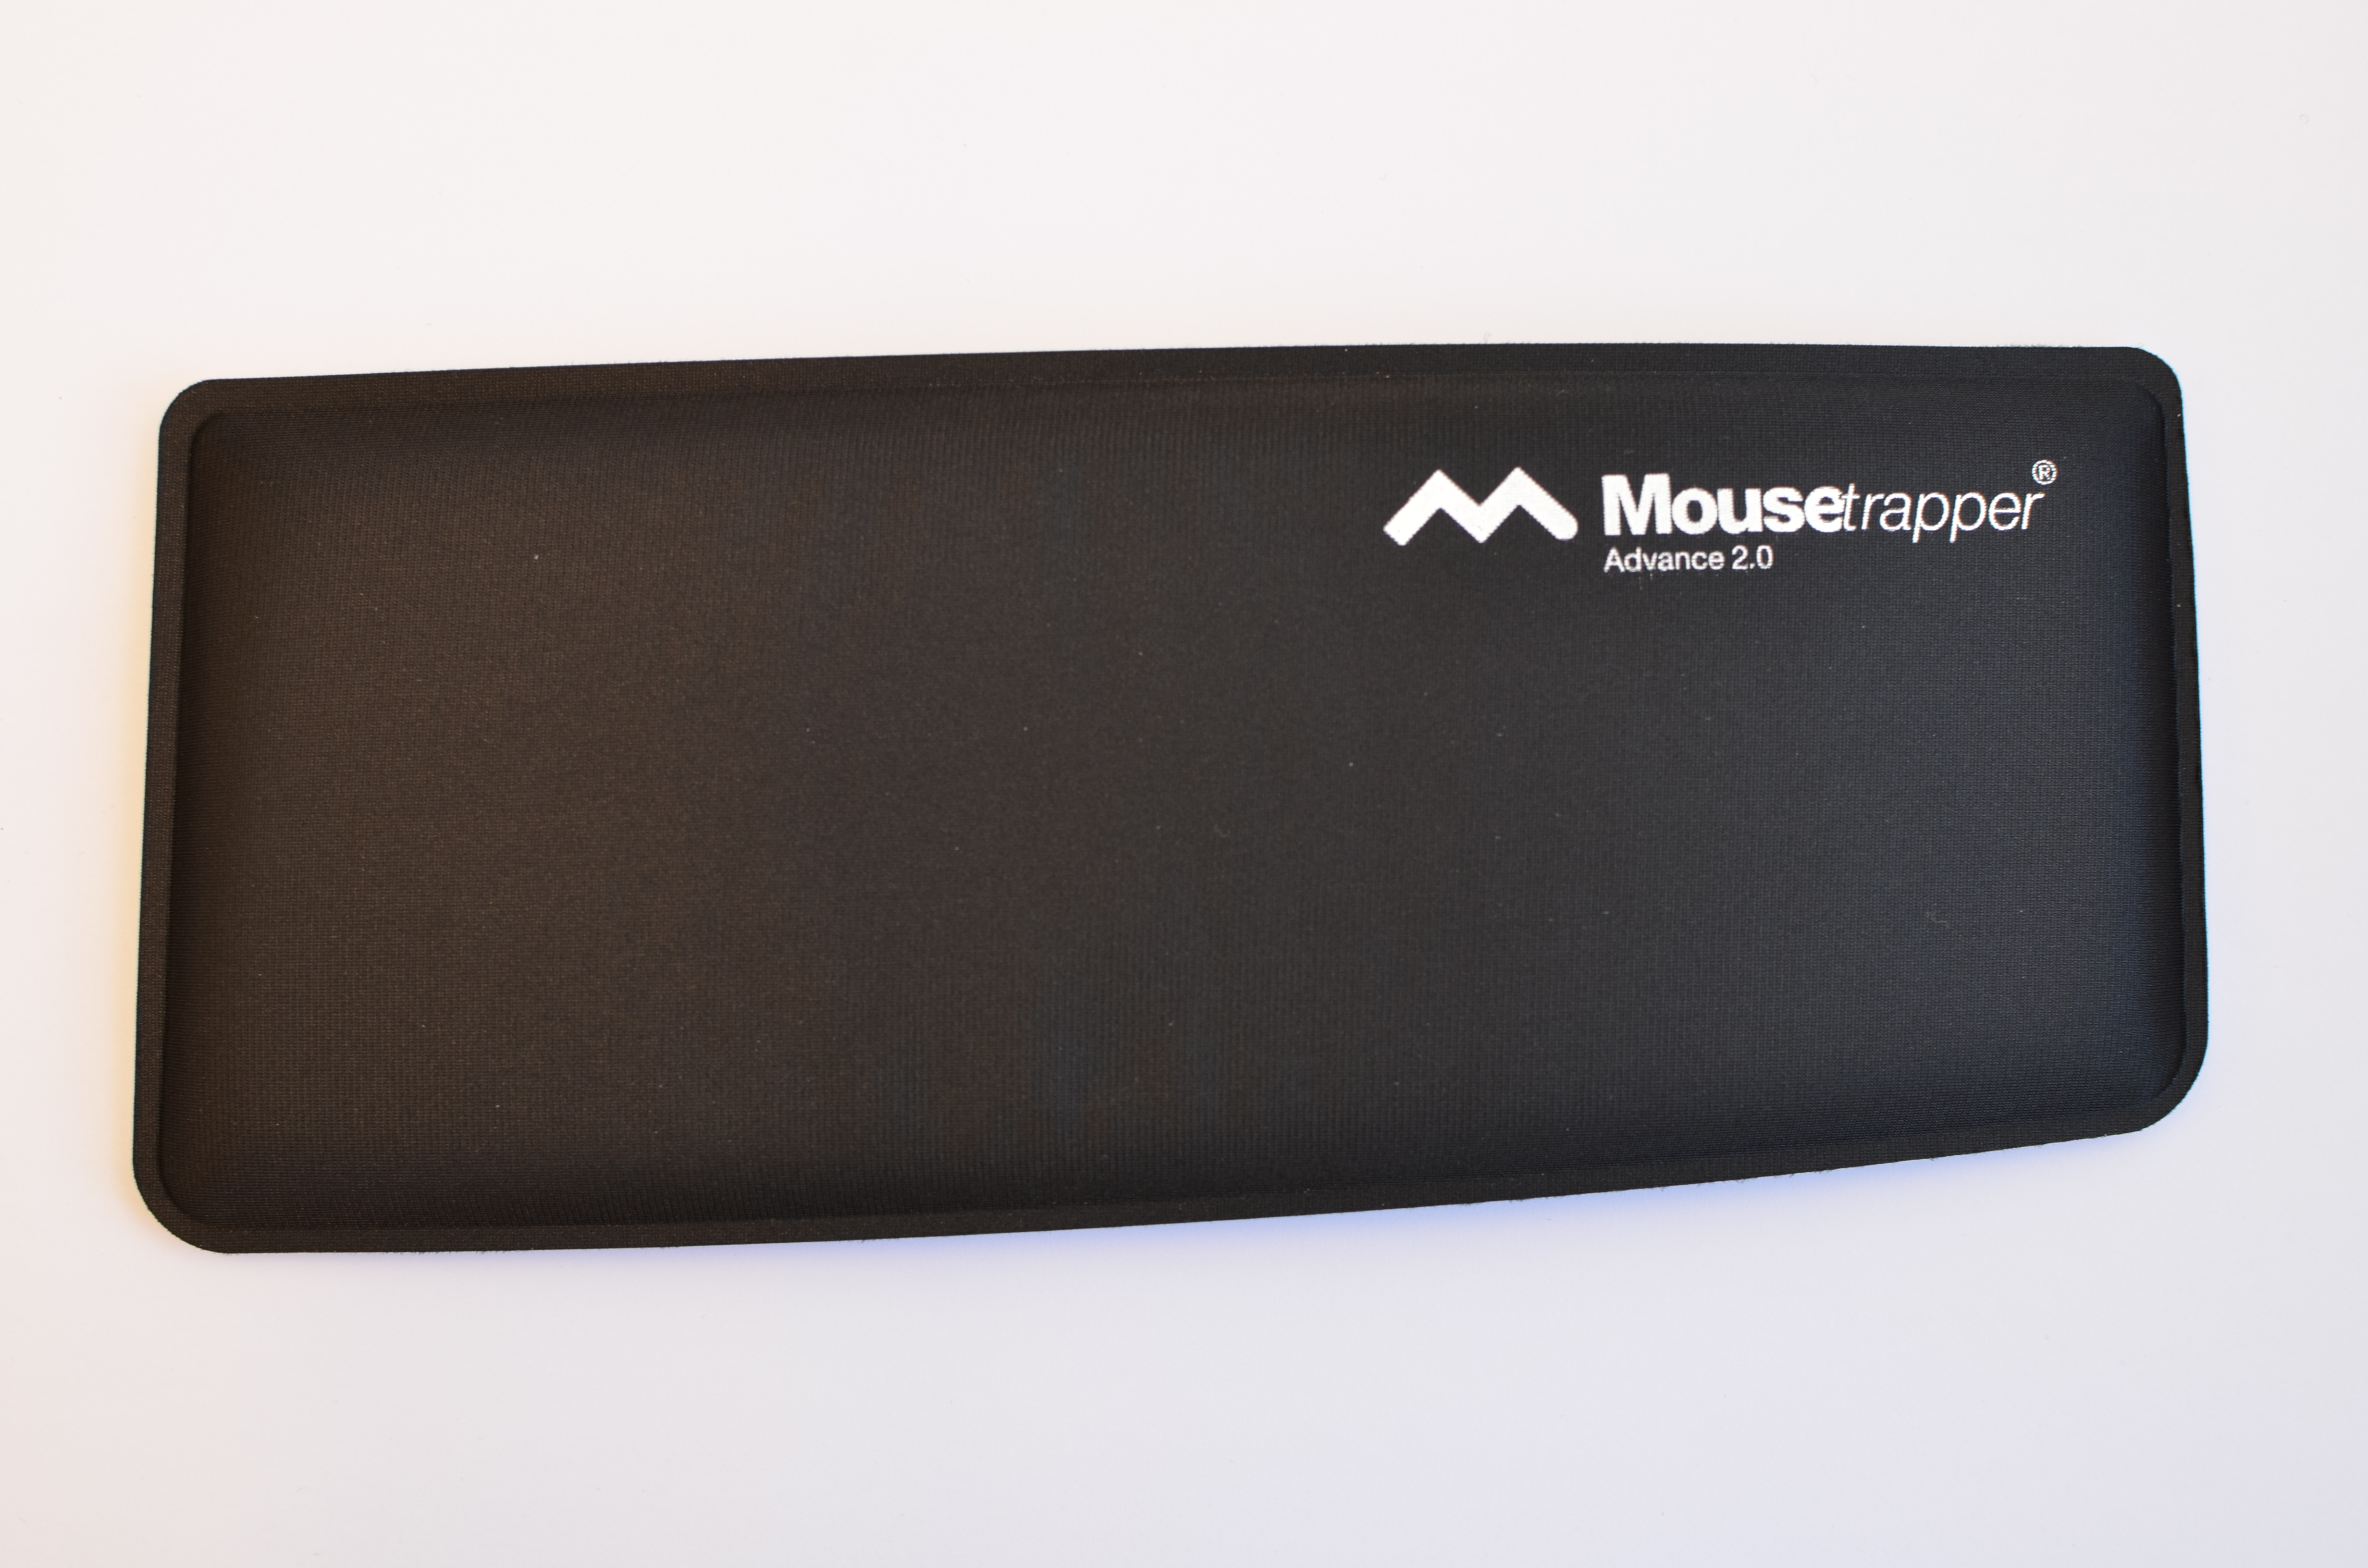 MouseTrapper Underarmsstøtte Advance 2.0, Sort/hvit